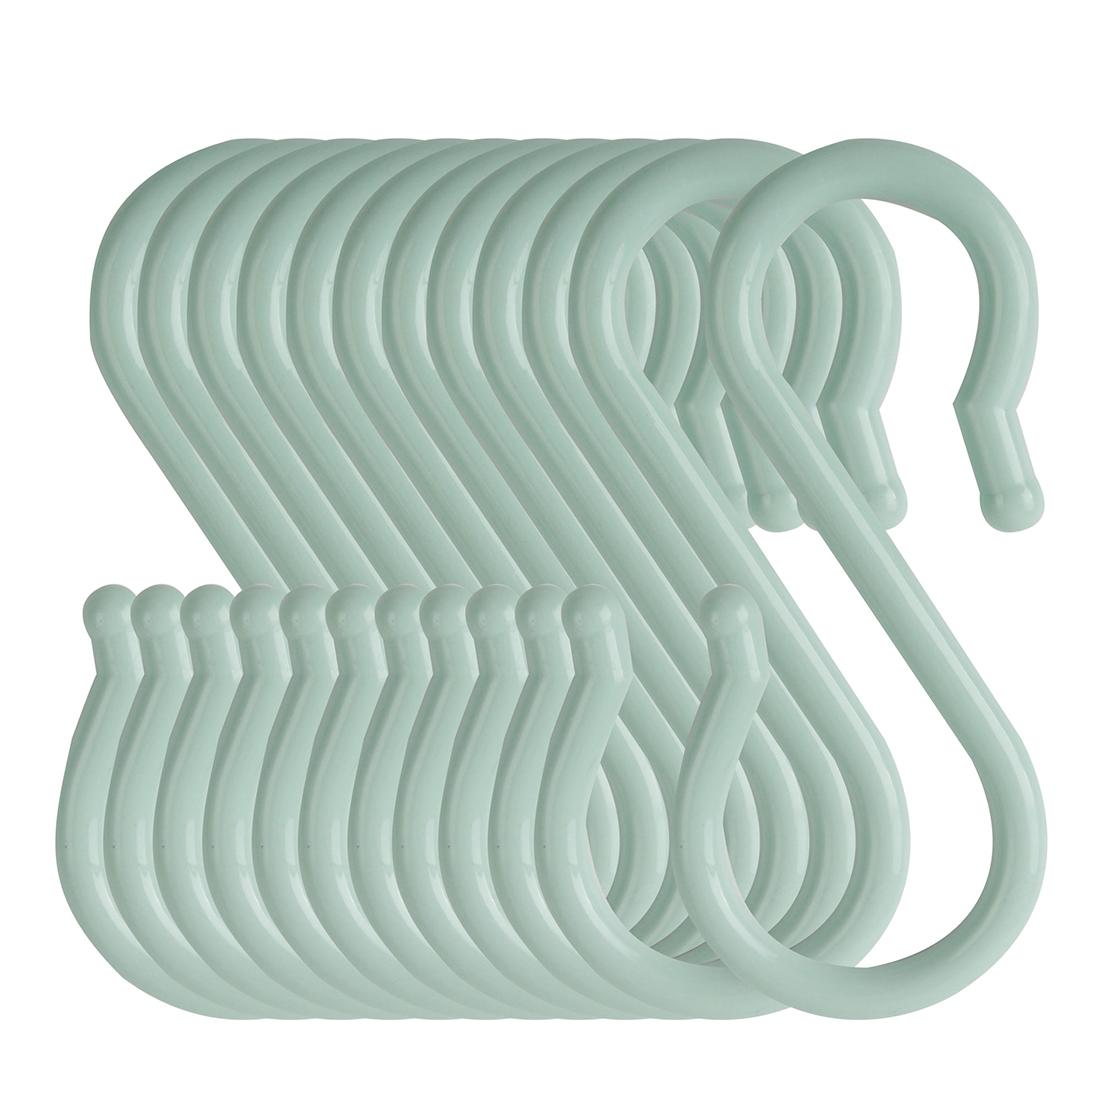 12 Pack S Hook Plastic for Kitchen Utensils Coat Towel Key Hanging Light Blue